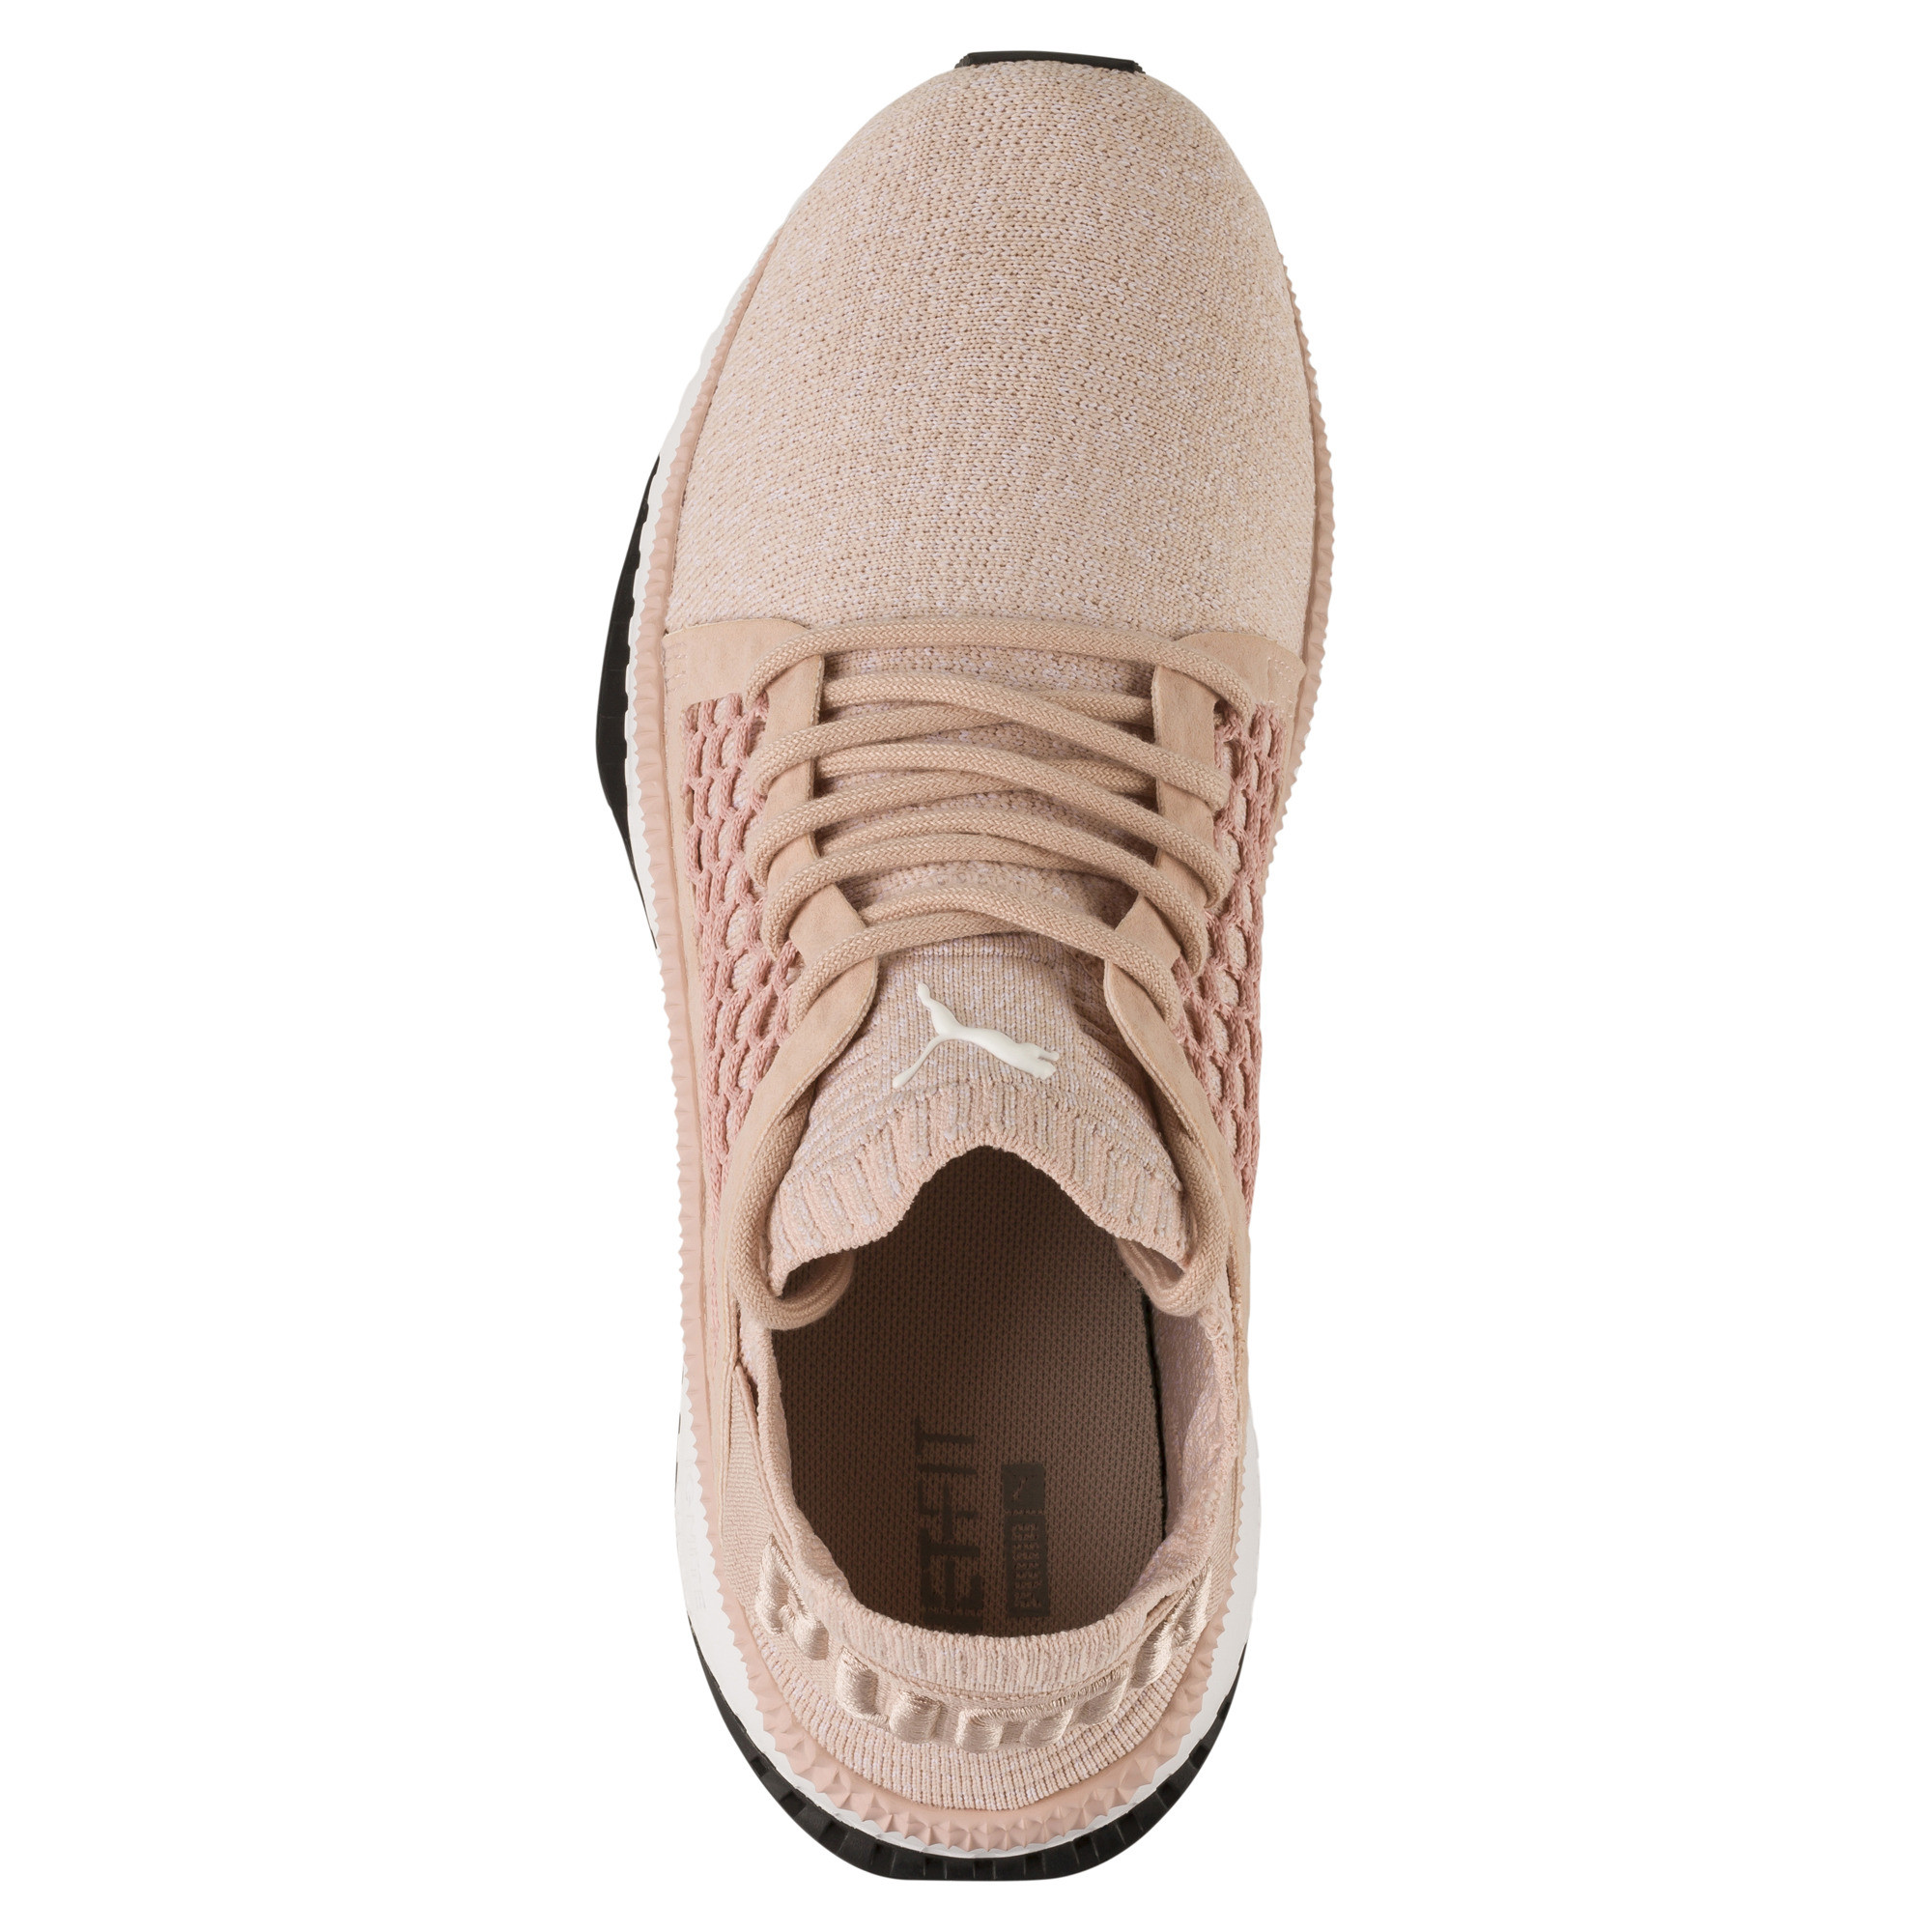 PUMA-TSUGI-NETFIT-evoKNIT-Sneaker-Frauen-Schuhe-Neu Indexbild 18